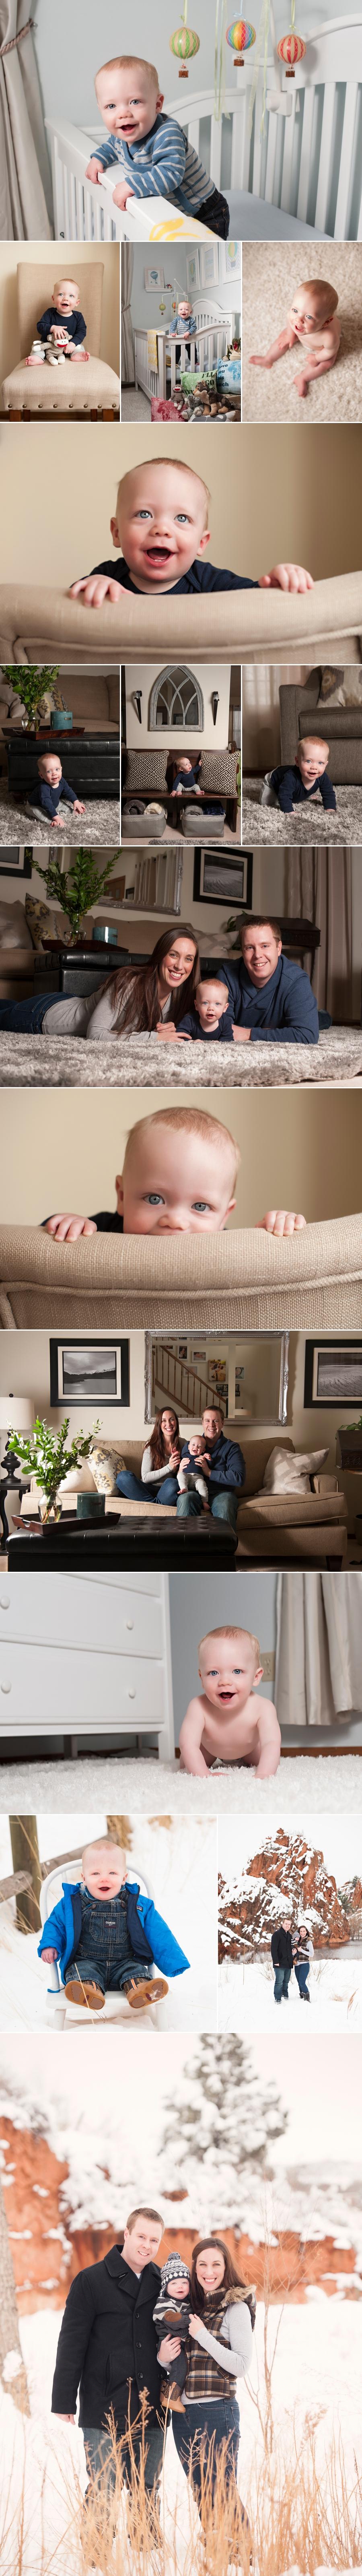 Colorado springs 6 month baby photography Jonathan Betz